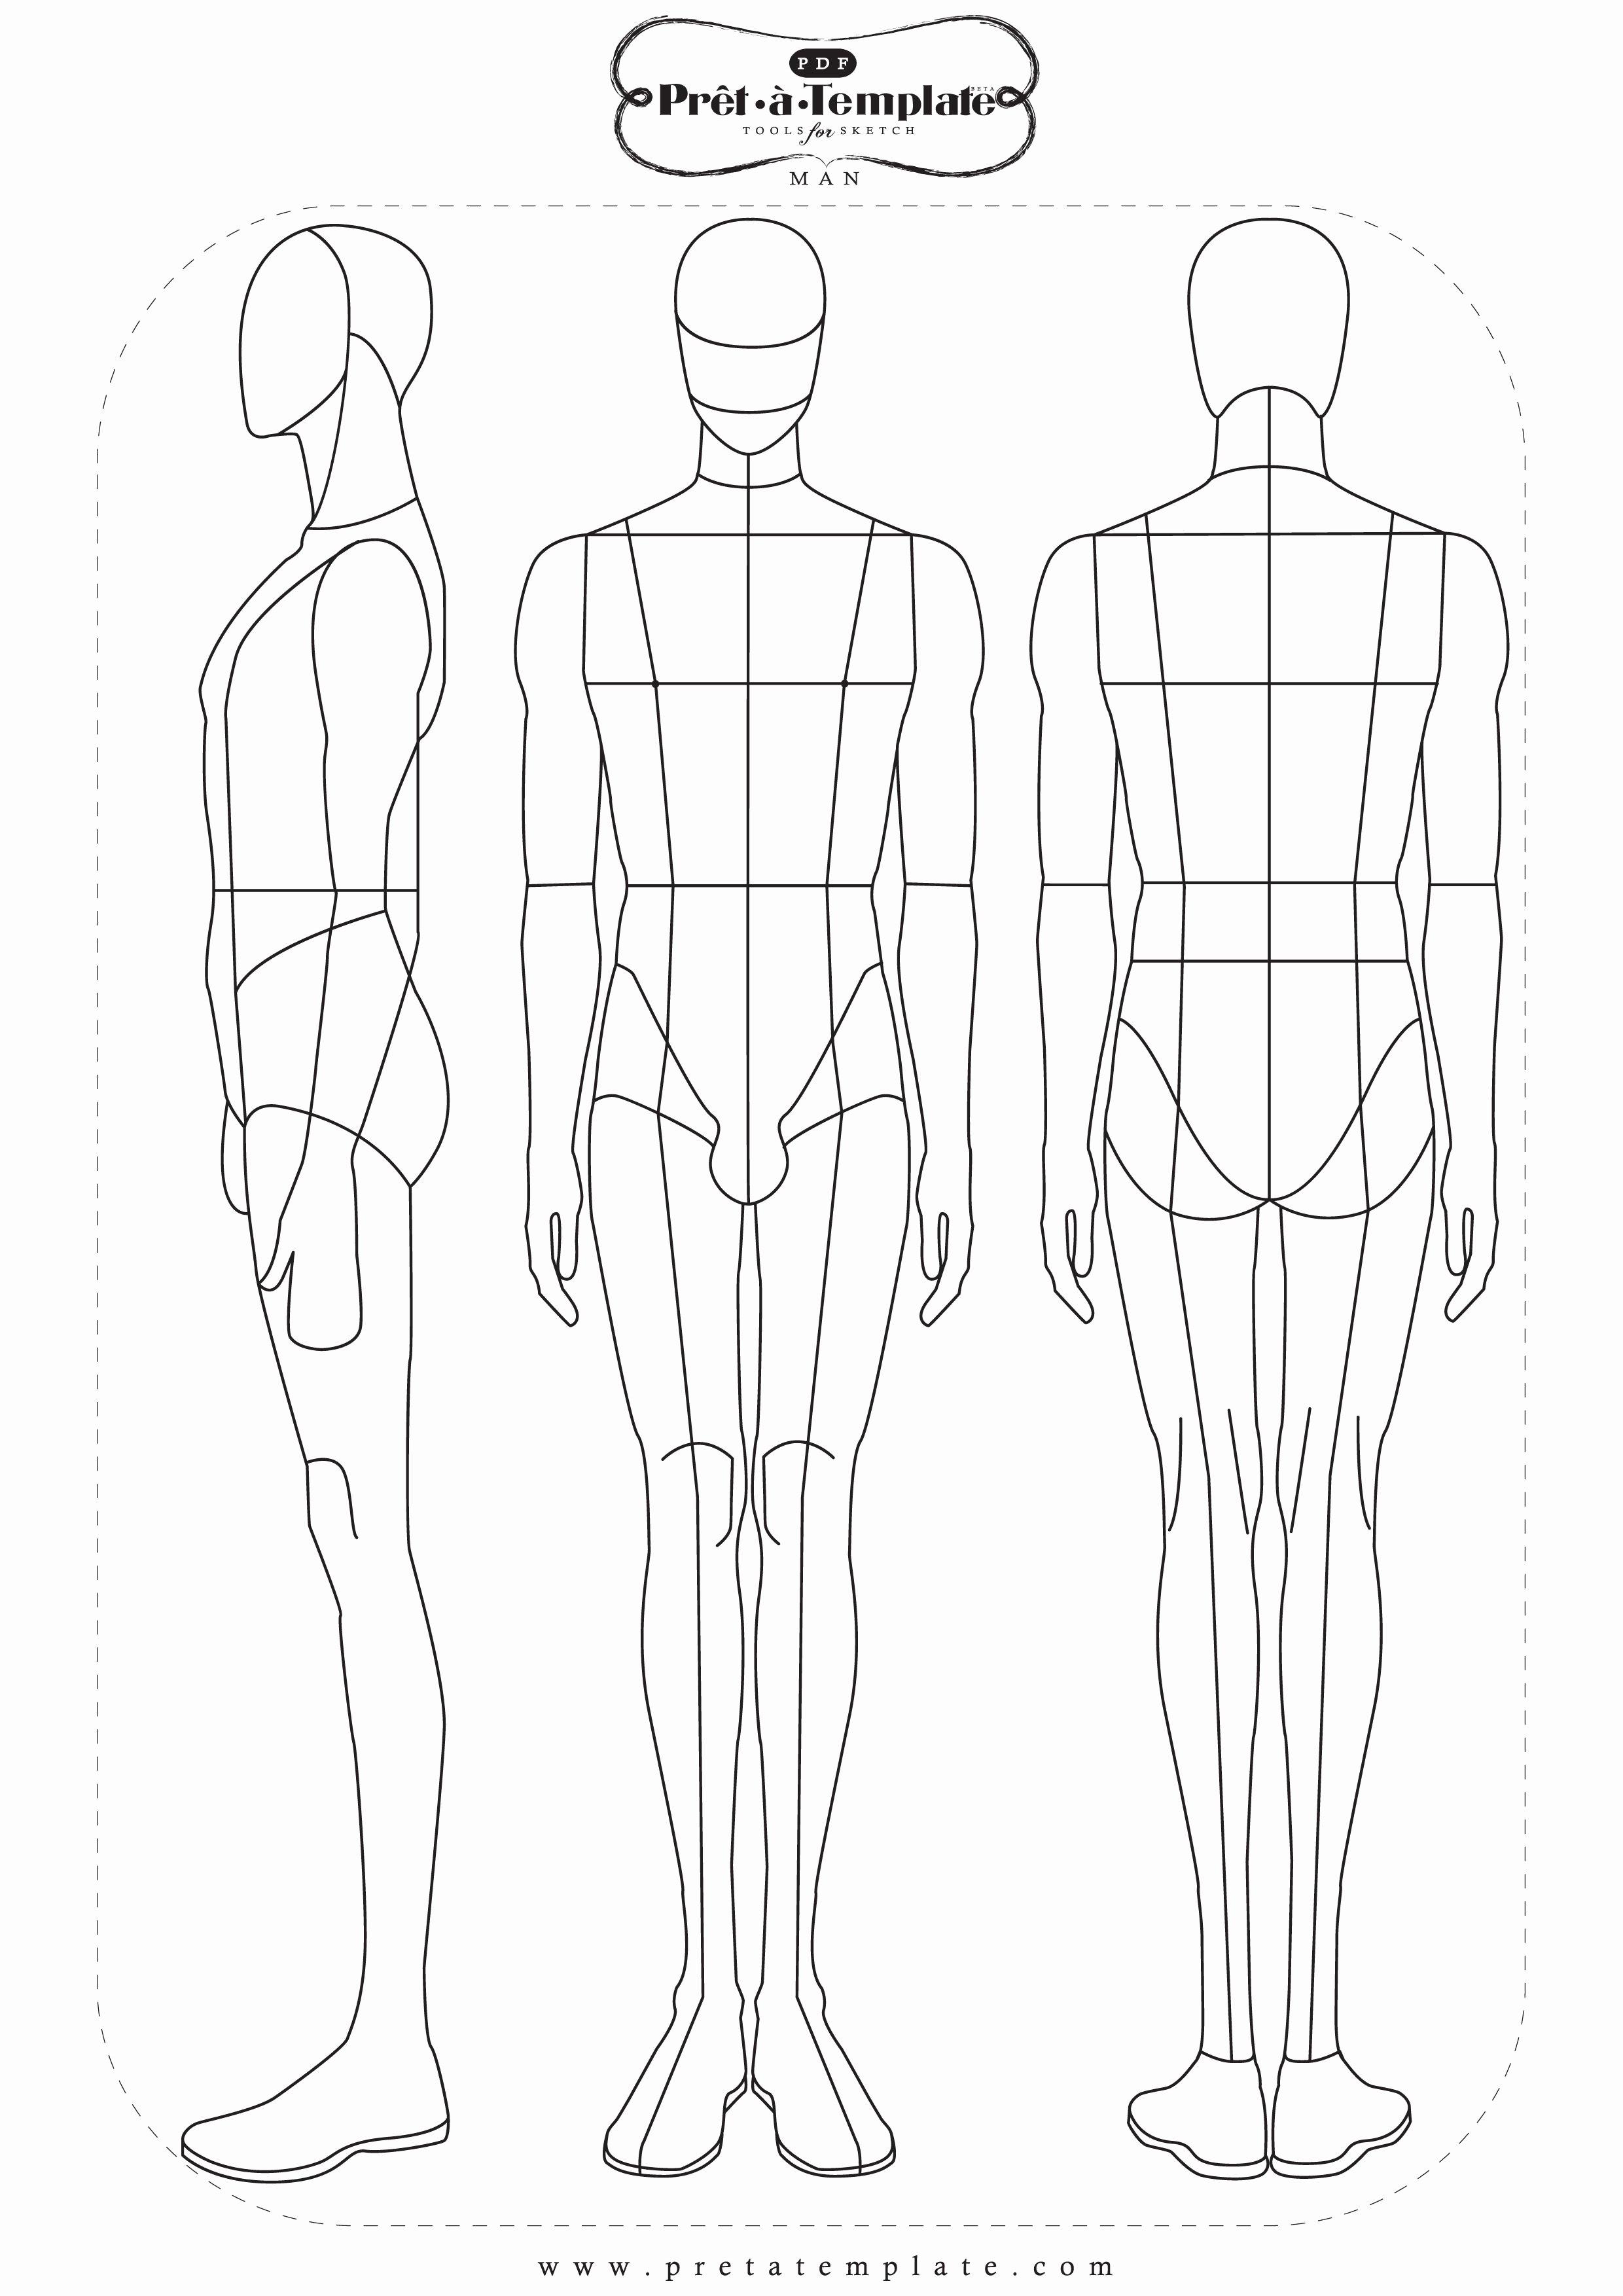 Costume Design Template Male Luxury Fashion Templates Fashion App Pret à Template Available